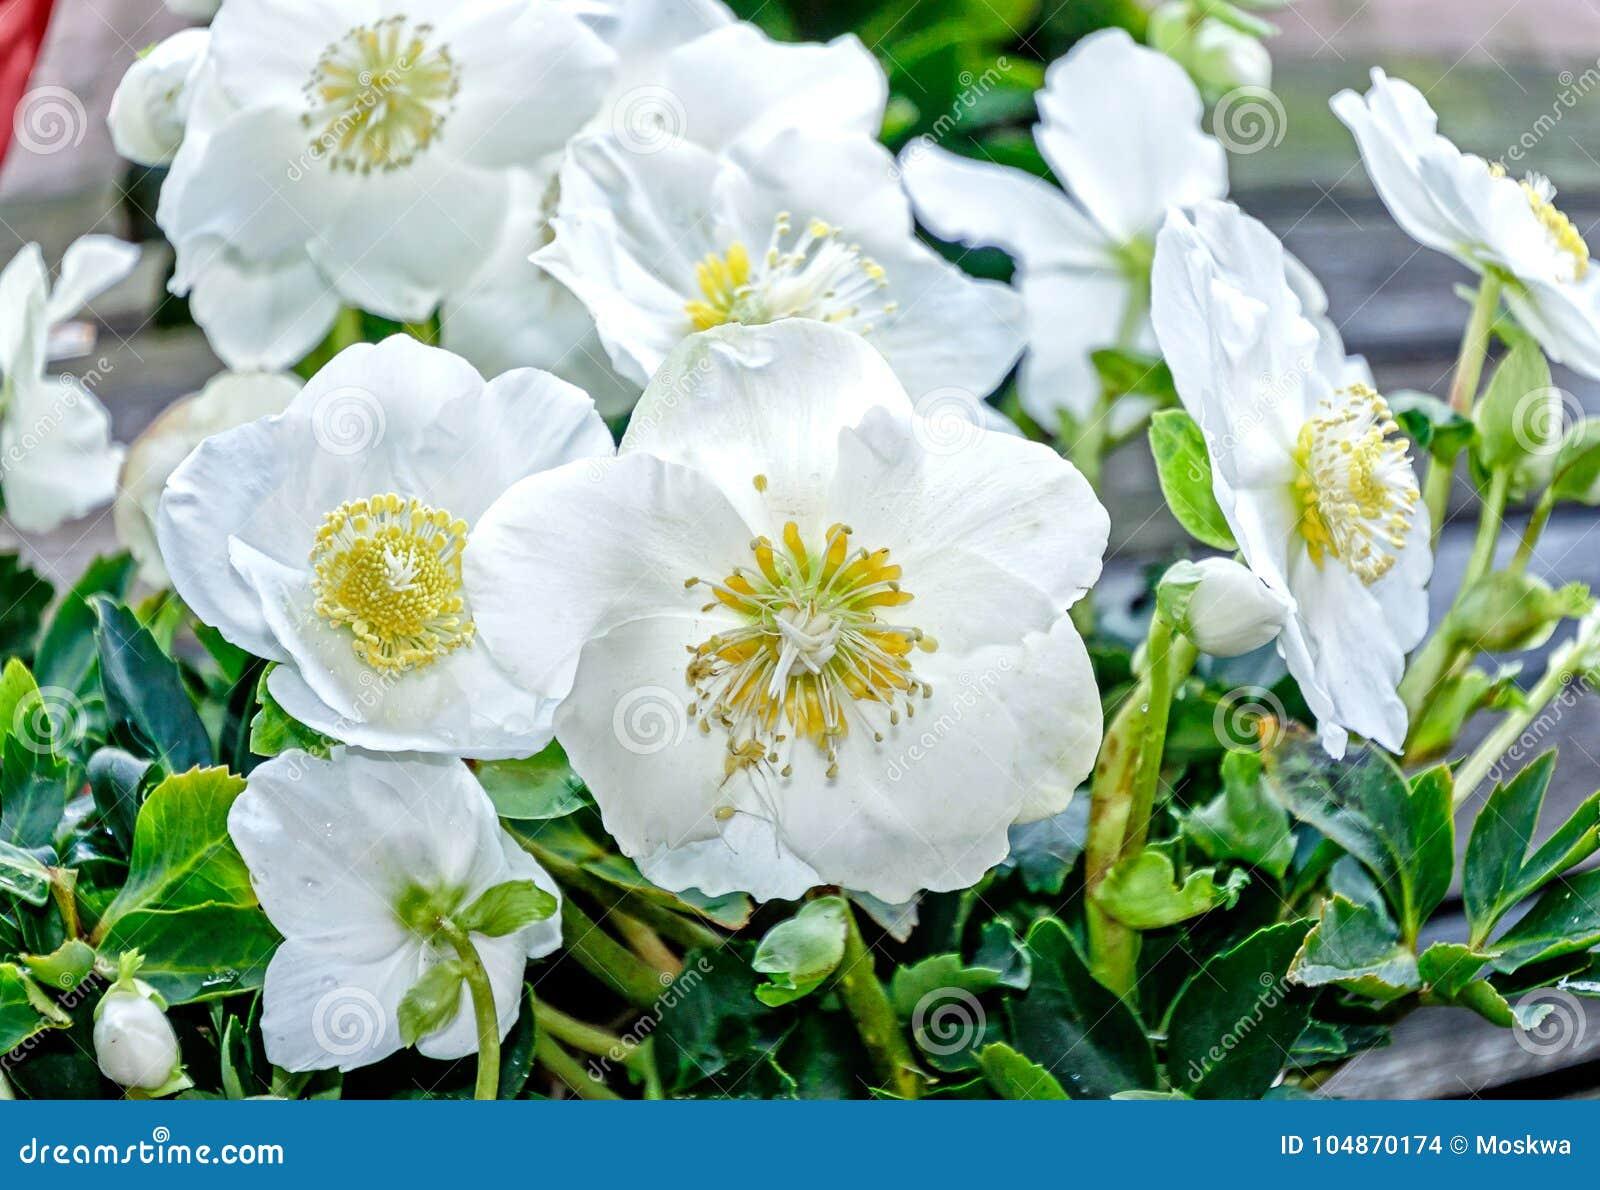 White Christmas Rose Hellebores Flowers Stock Photo Image Of Black